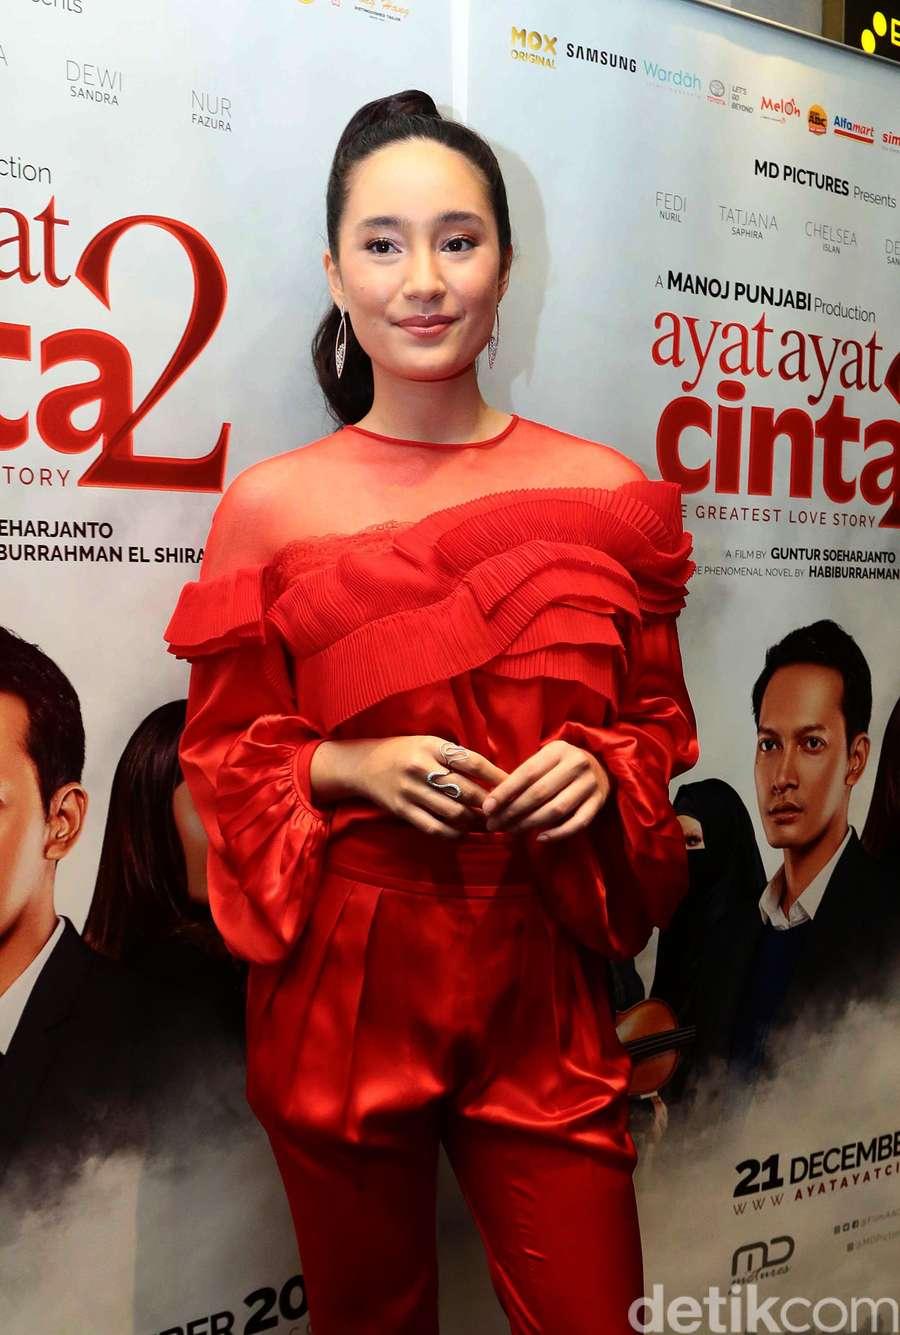 Tatjana Saphira Dazzling in Red